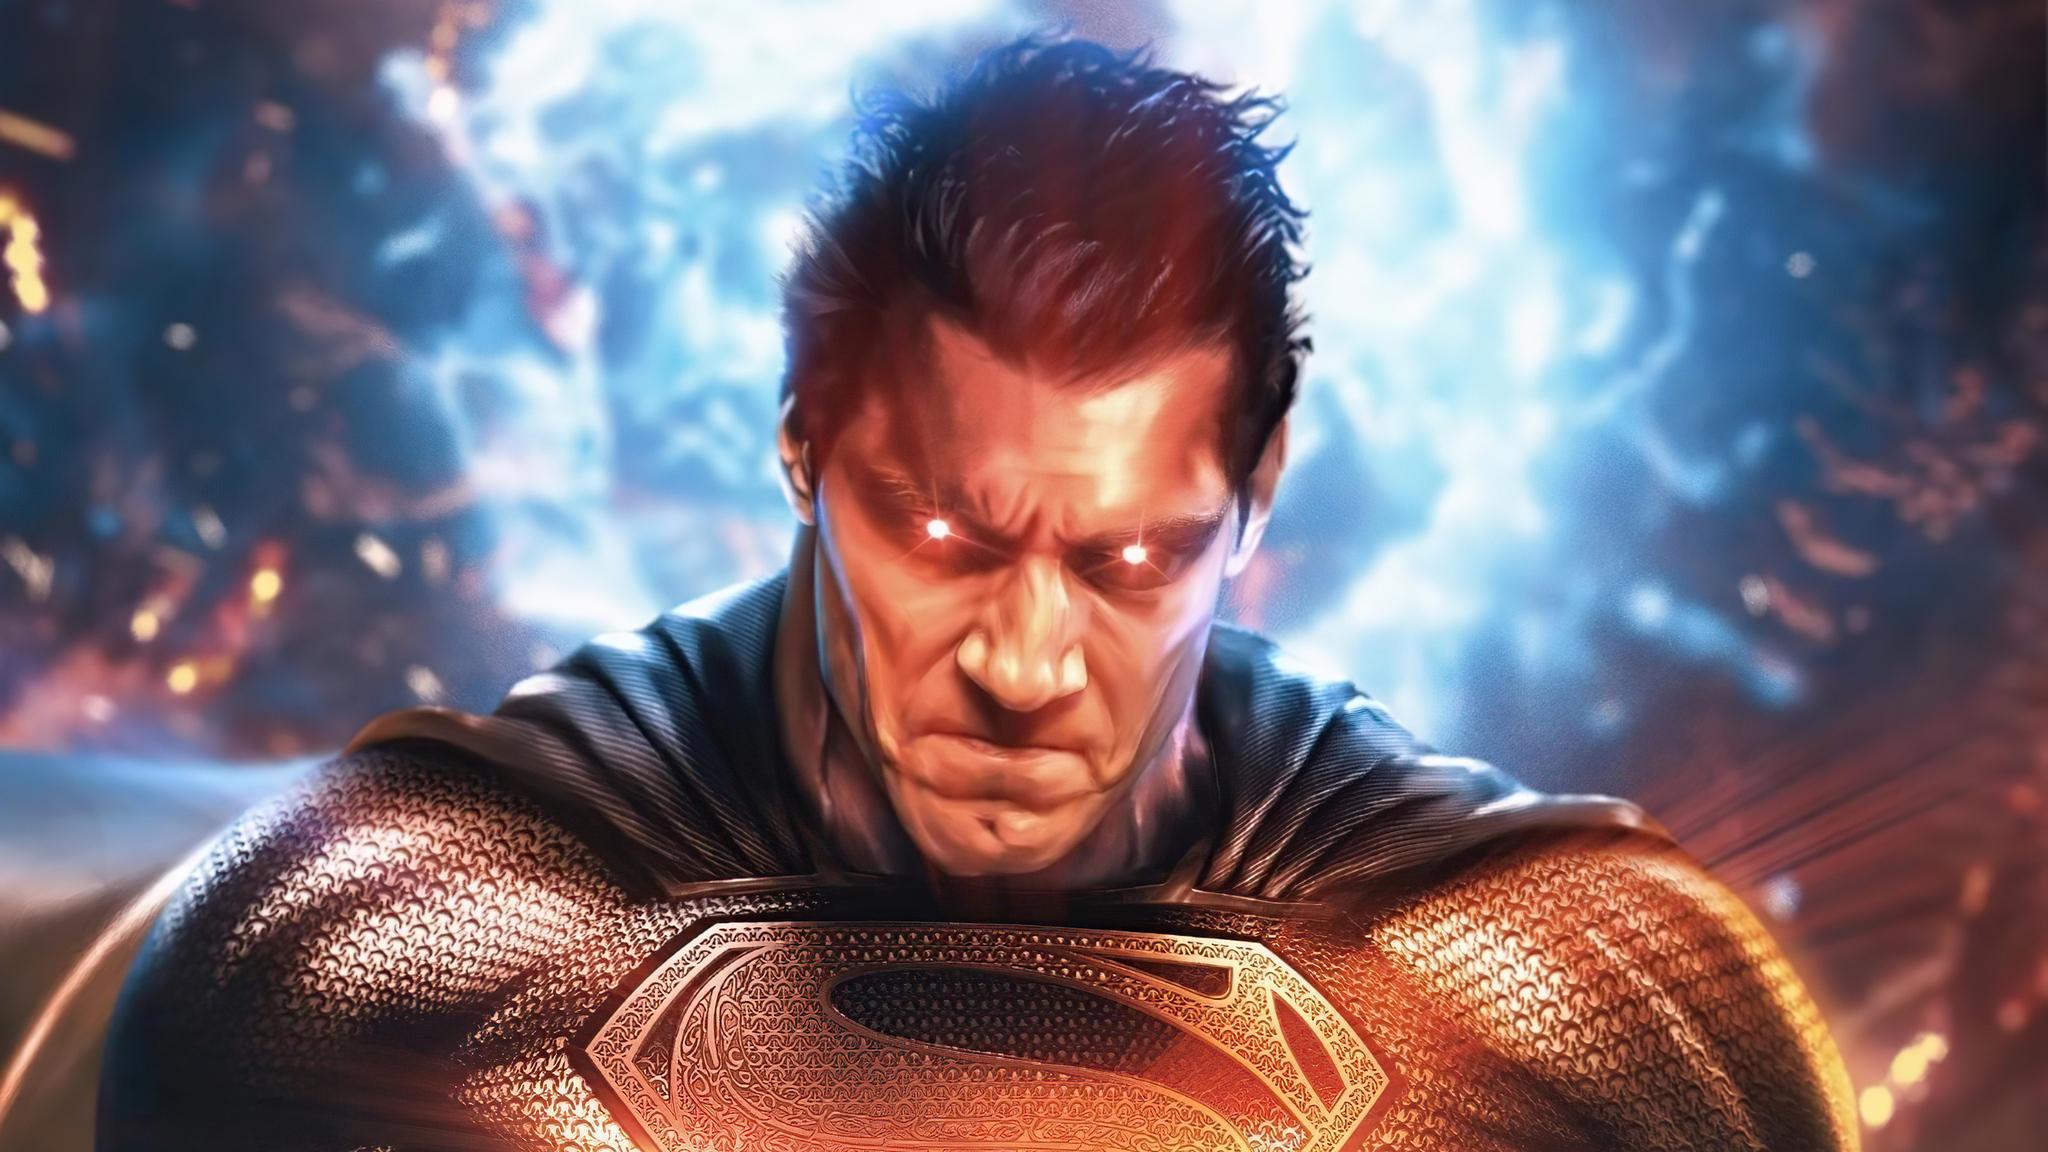 superman-the-man-of-tomorrow-black-suit-5k-ea.jpg